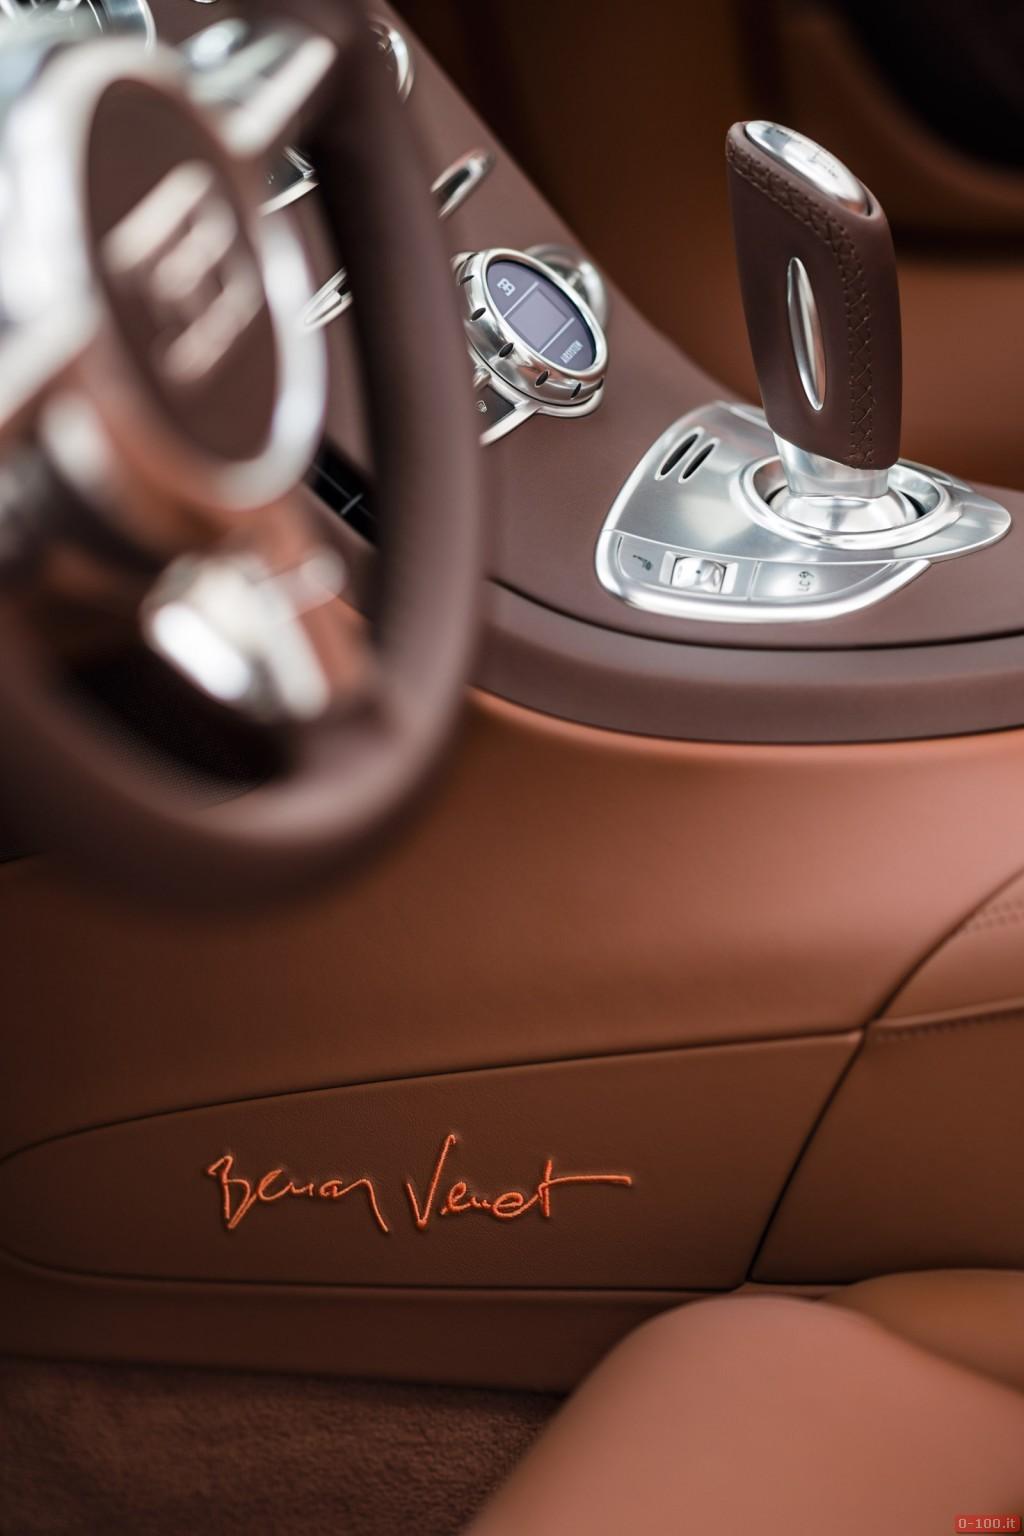 Veyron Grand Sport Venet_0-10010